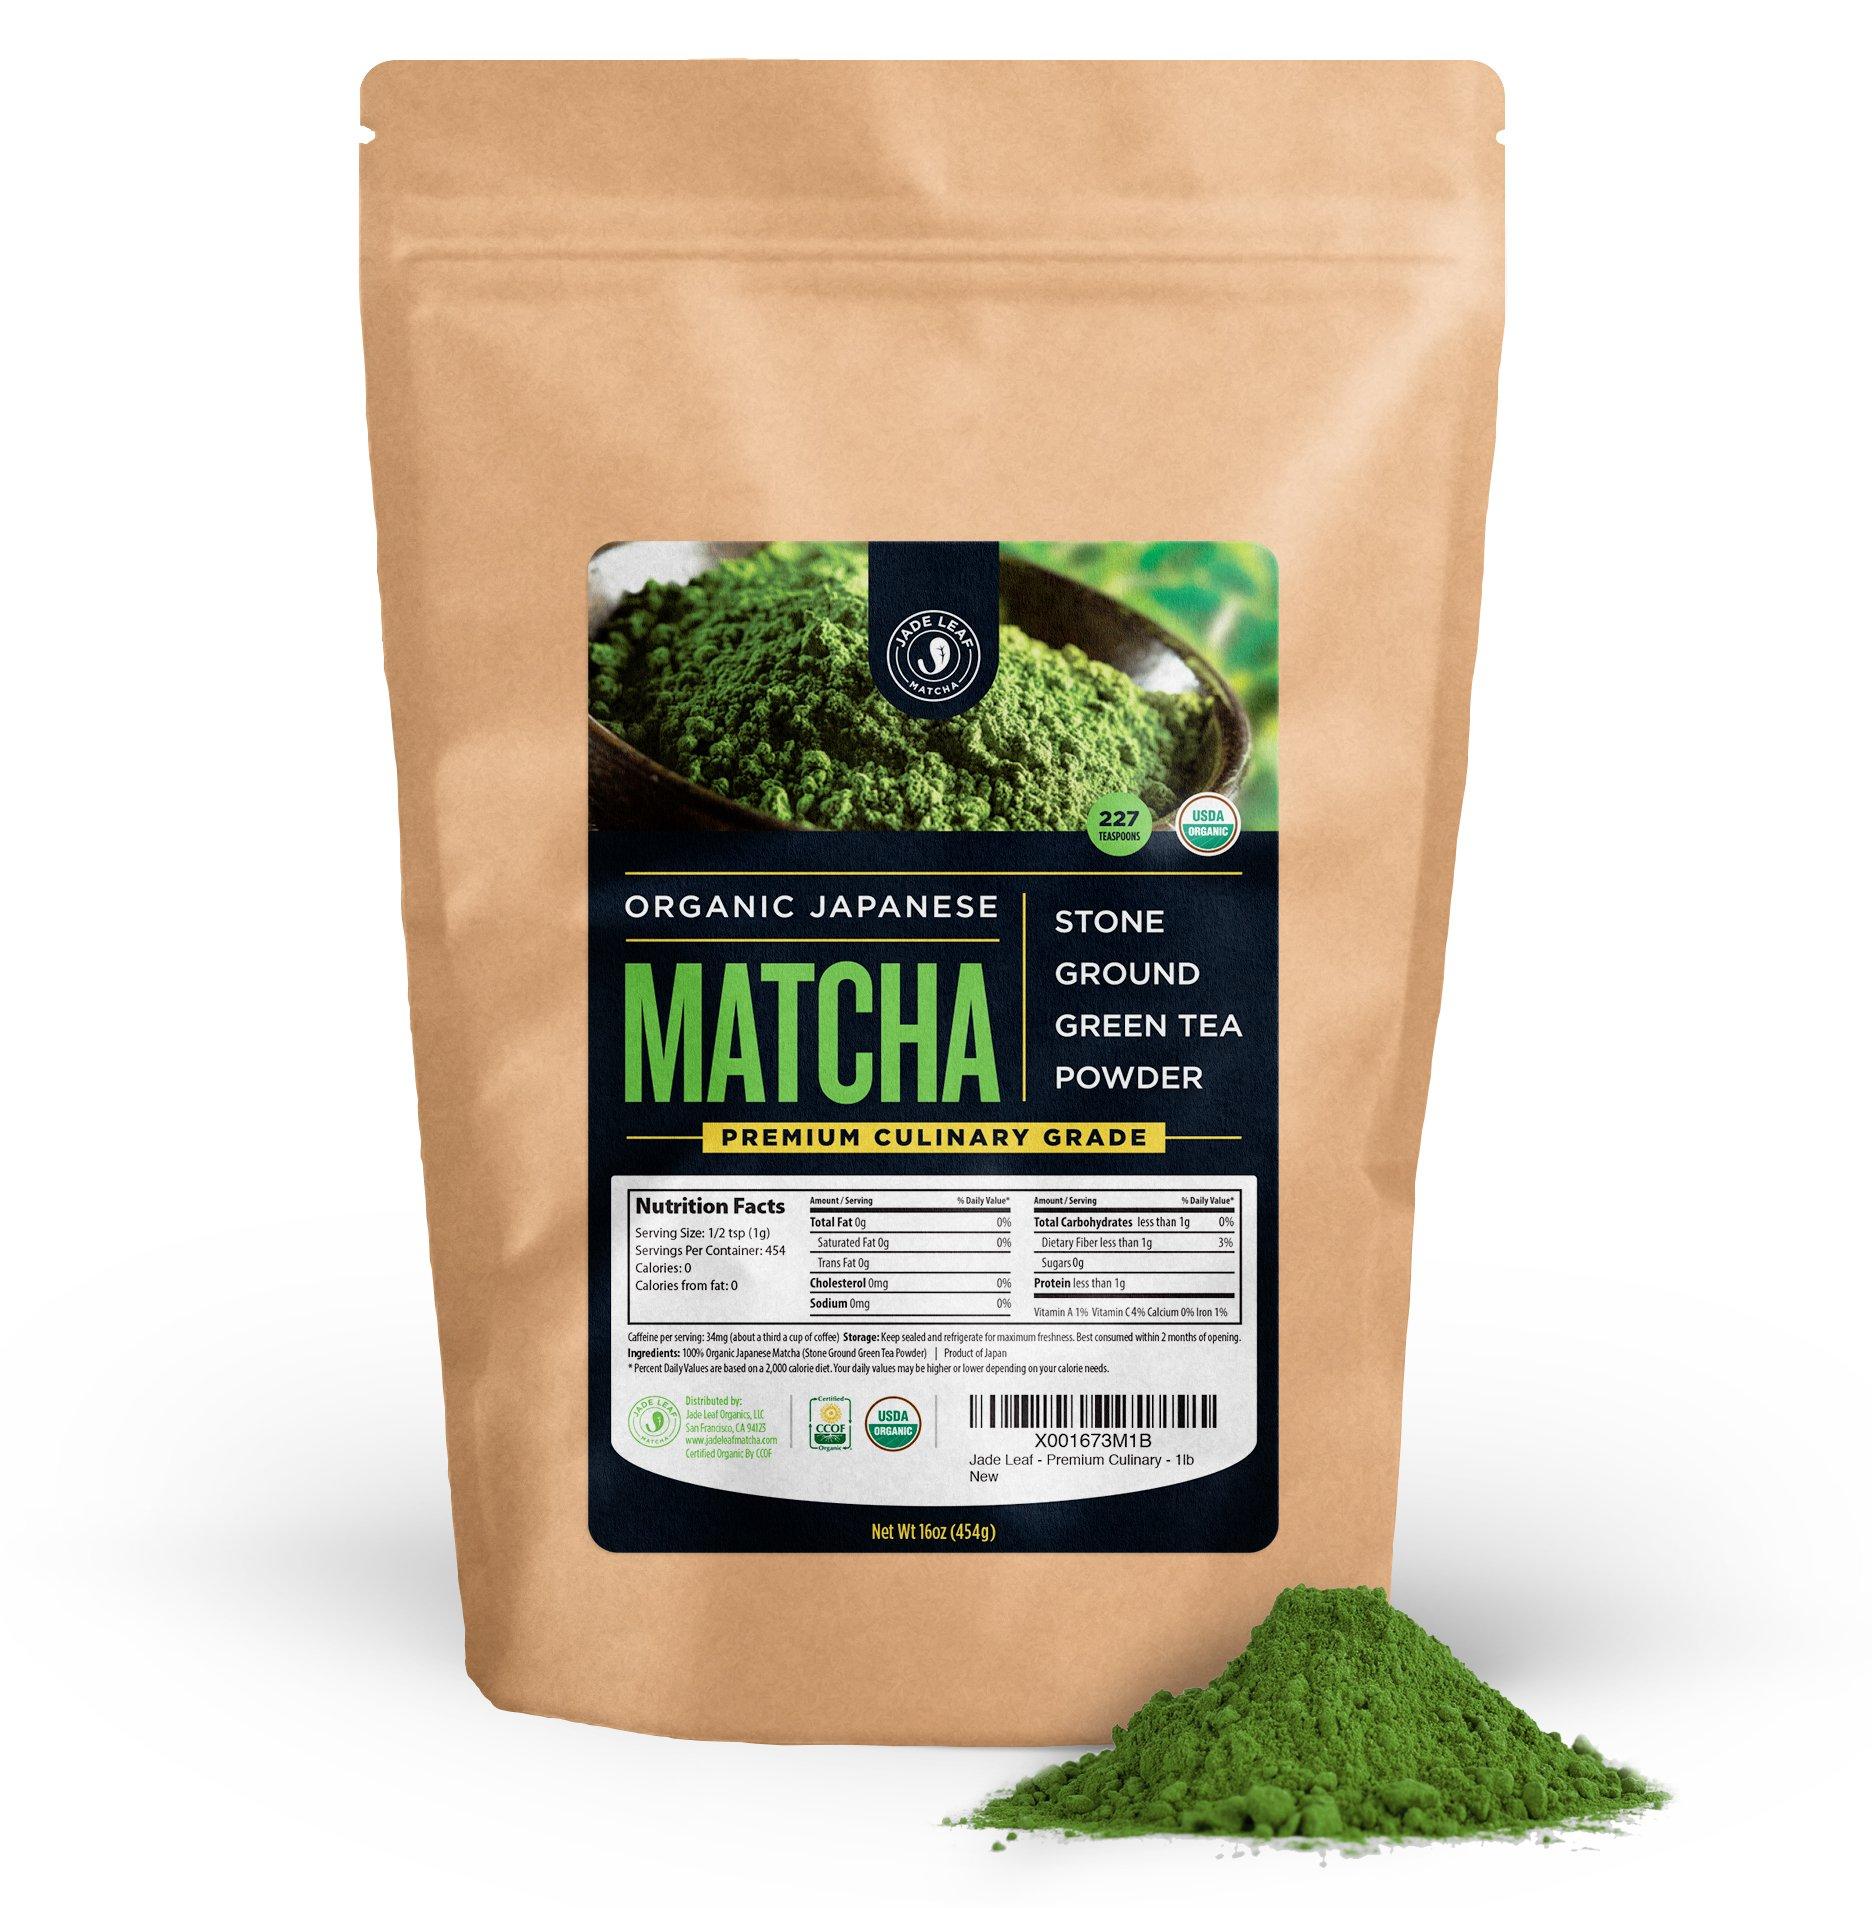 Jade Leaf - Organic Japanese Matcha Green Tea Powder, Premium Culinary Grade (Preferred By Chefs and Cafes for Blending & Baking) - [1lb Bulk Size] by Jade Leaf Matcha